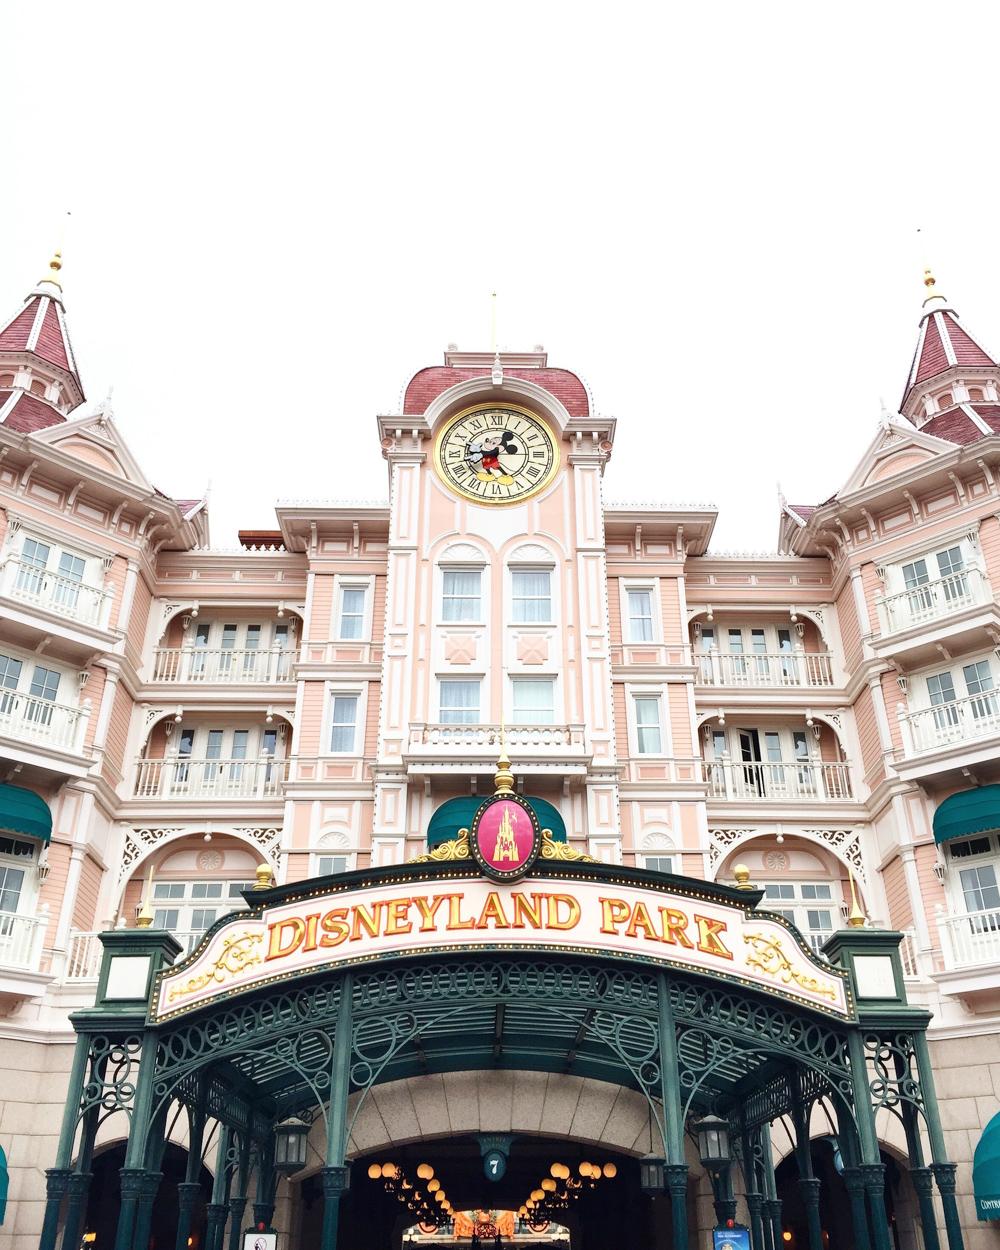 Disneyland Paris Main Entrance